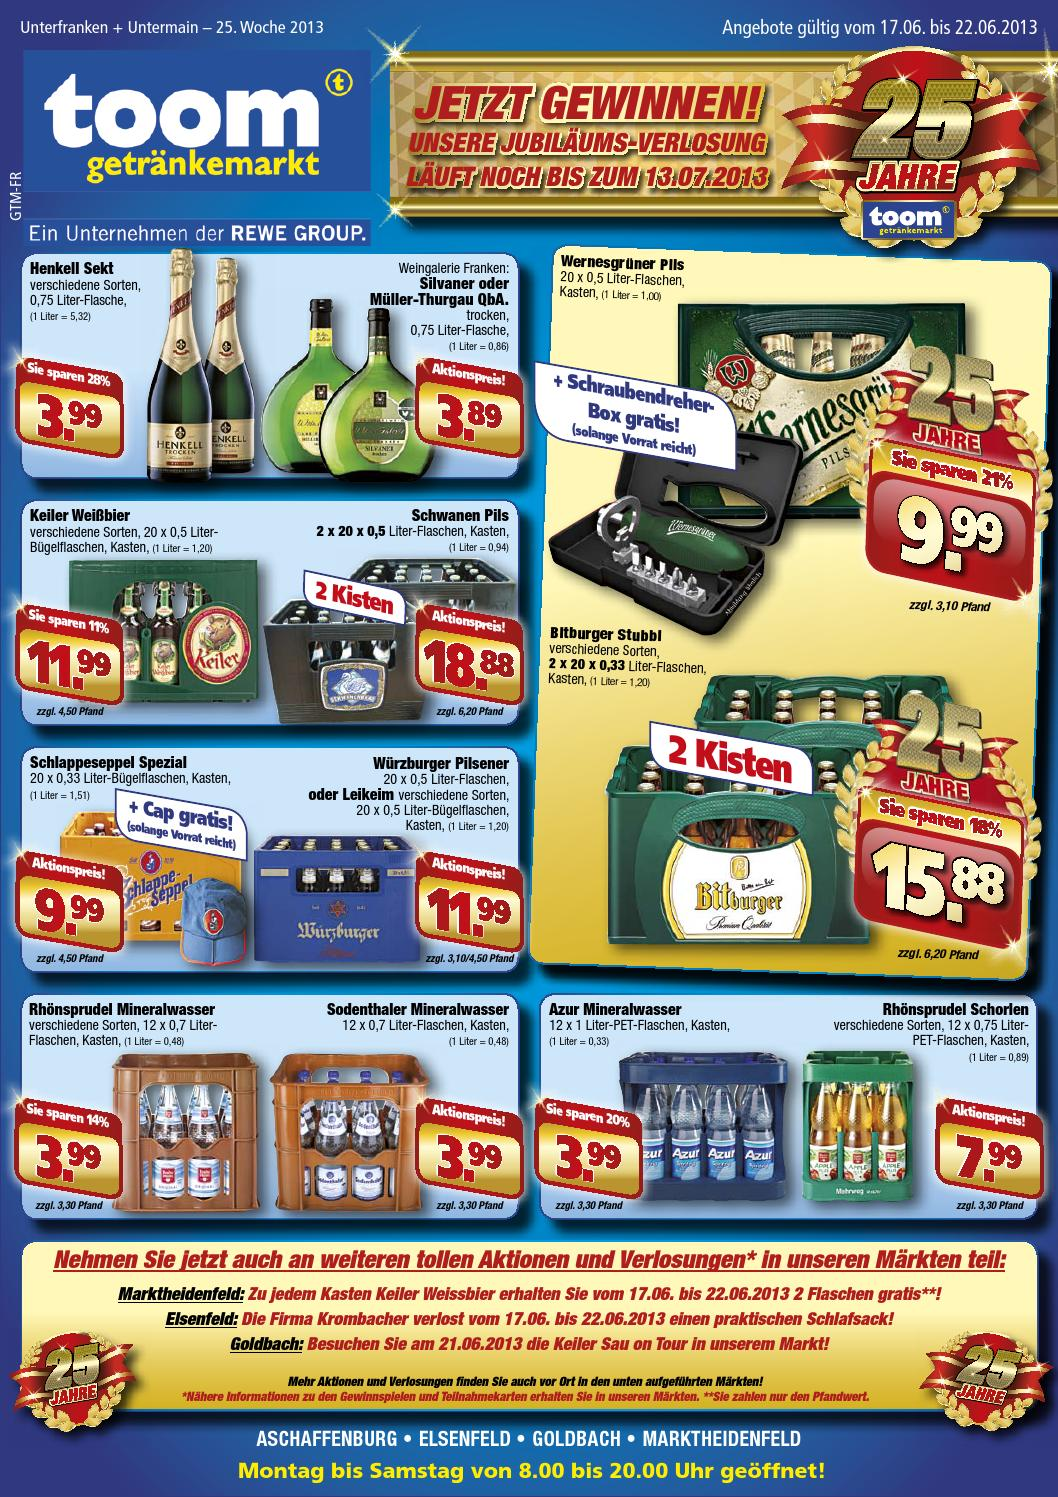 Toom Getränkemarkt Katalog gültig bis 22/06 by broshuri - issuu